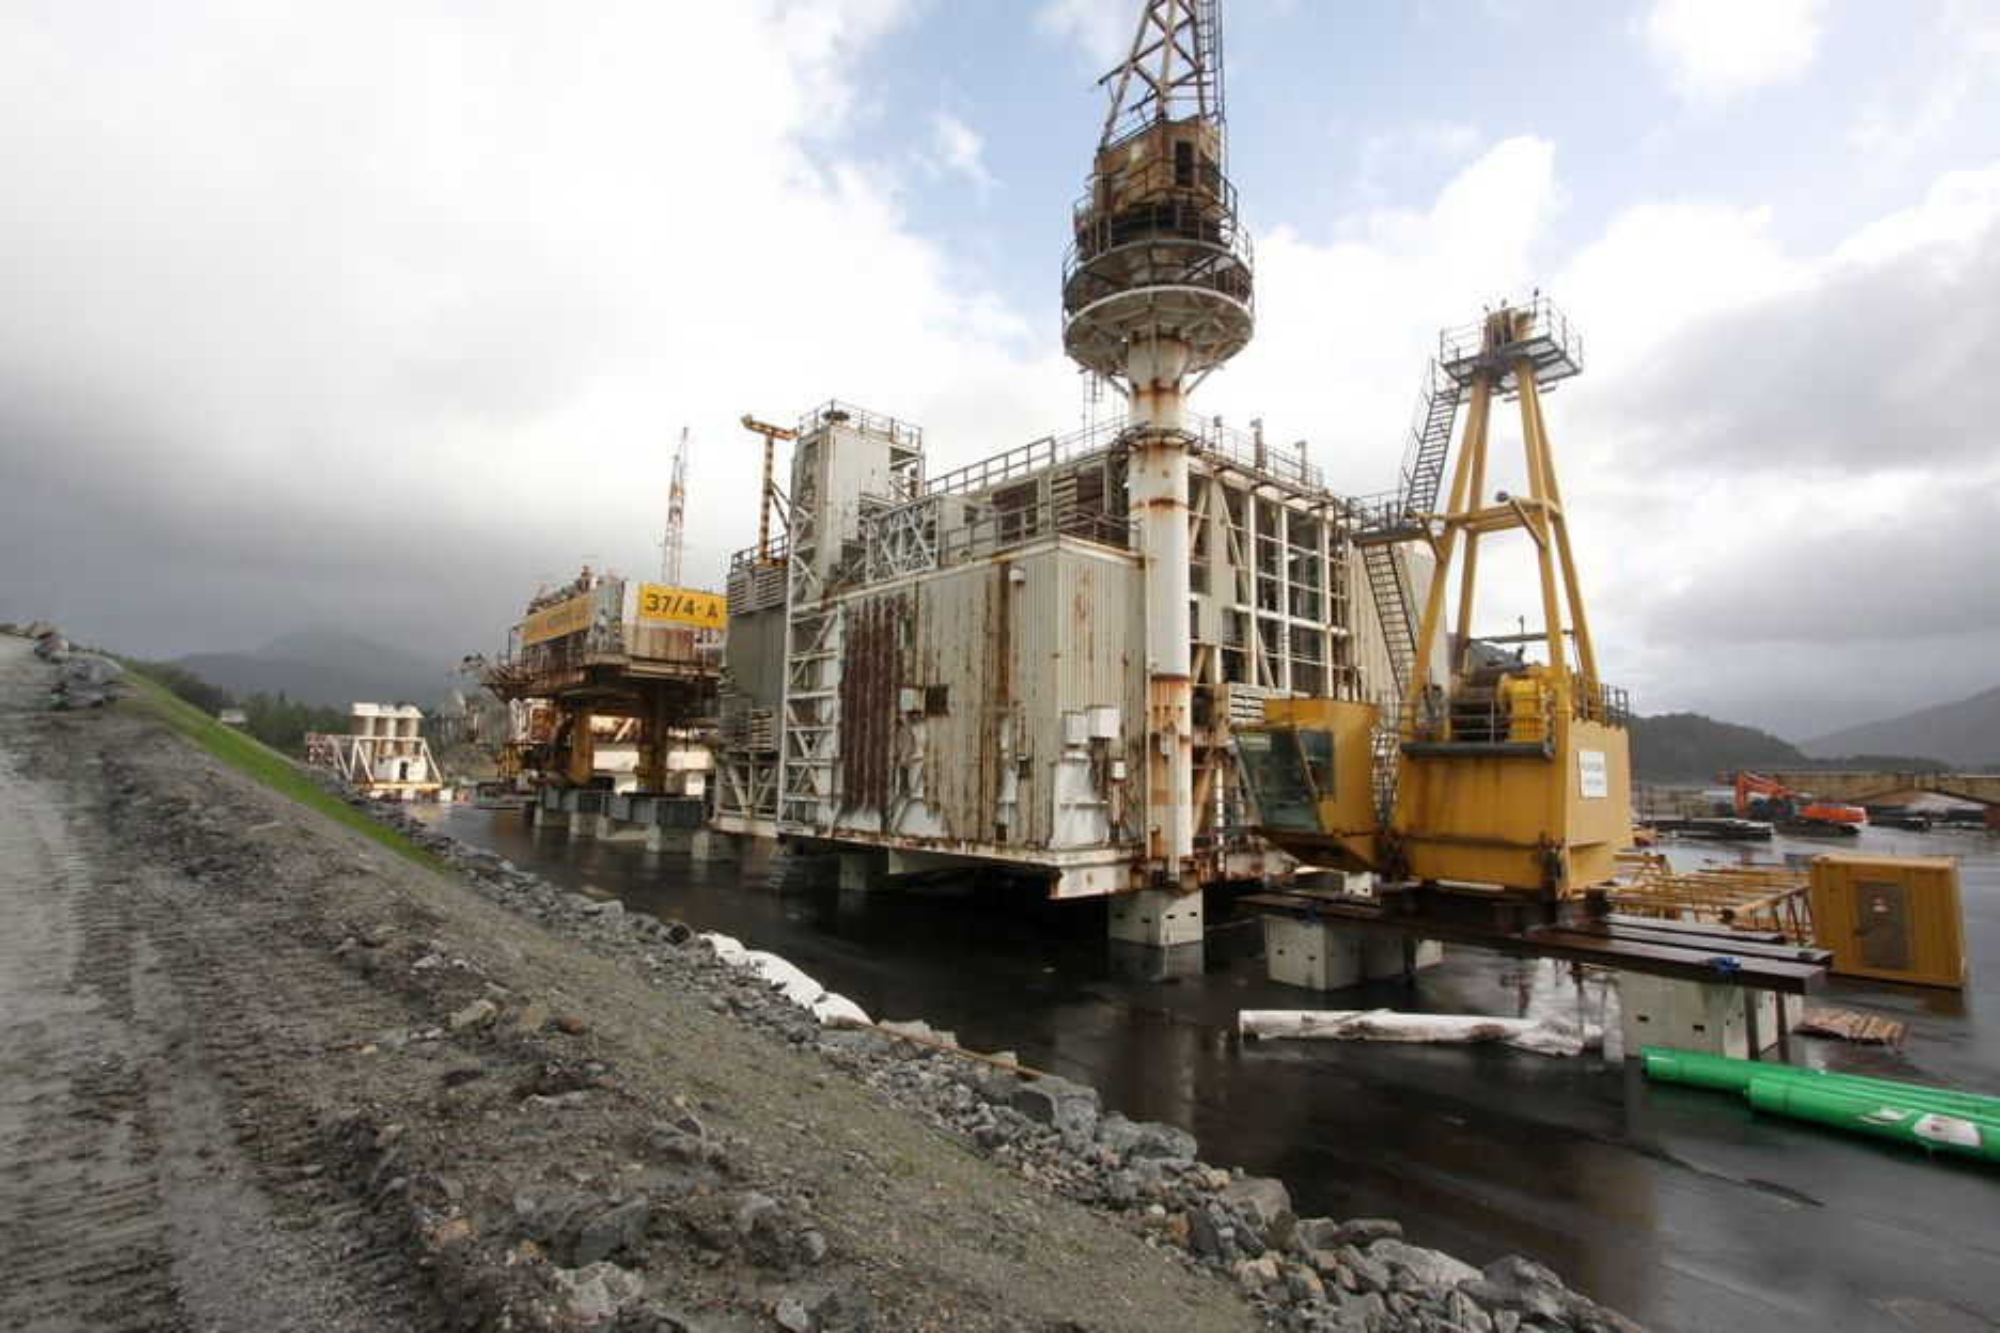 Det nye kommunestyret i Vindafjord vil stanse plattformopphuggingen i Vats.